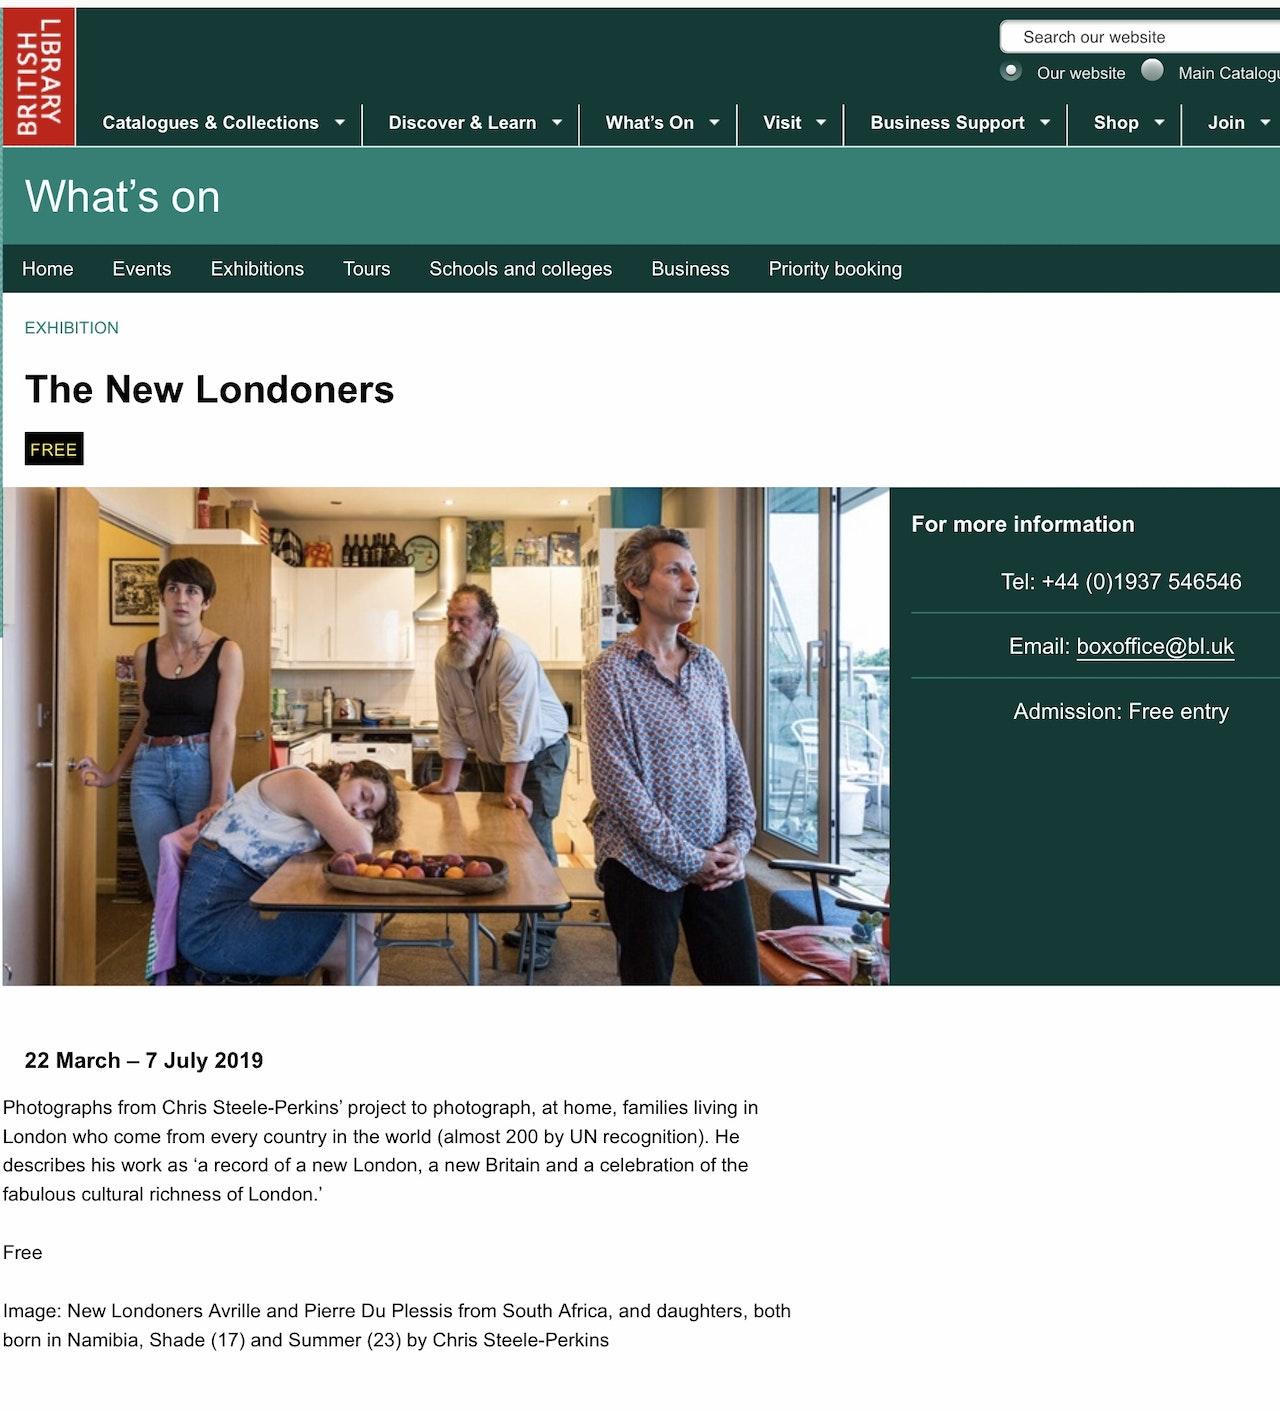 British Library Exhibition 22 Mar-7 July